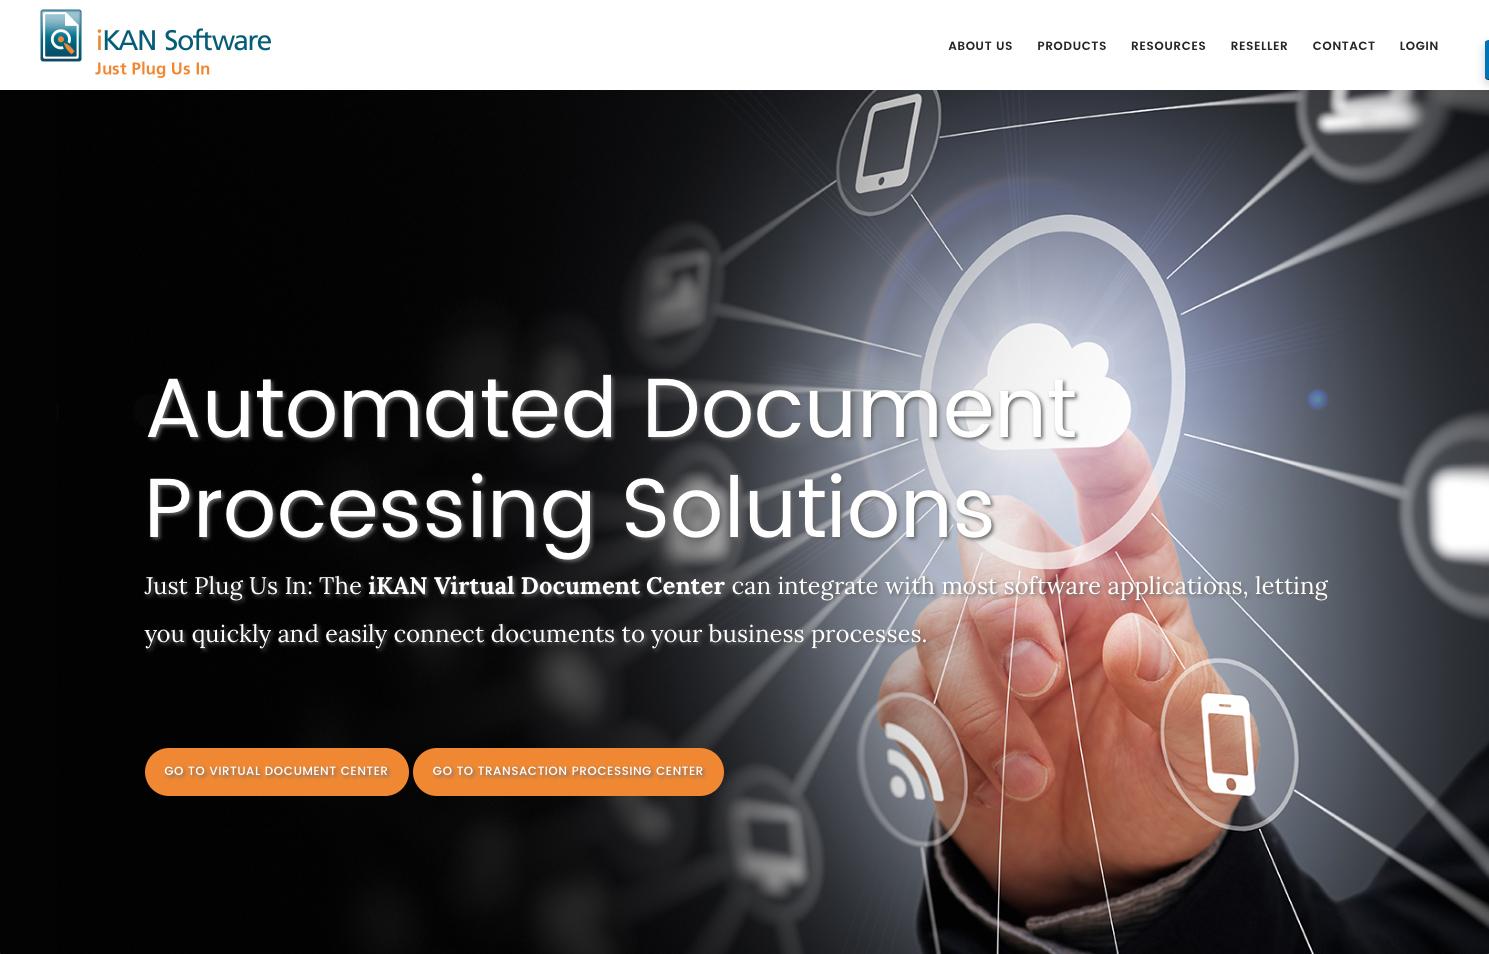 iKAN Software web site